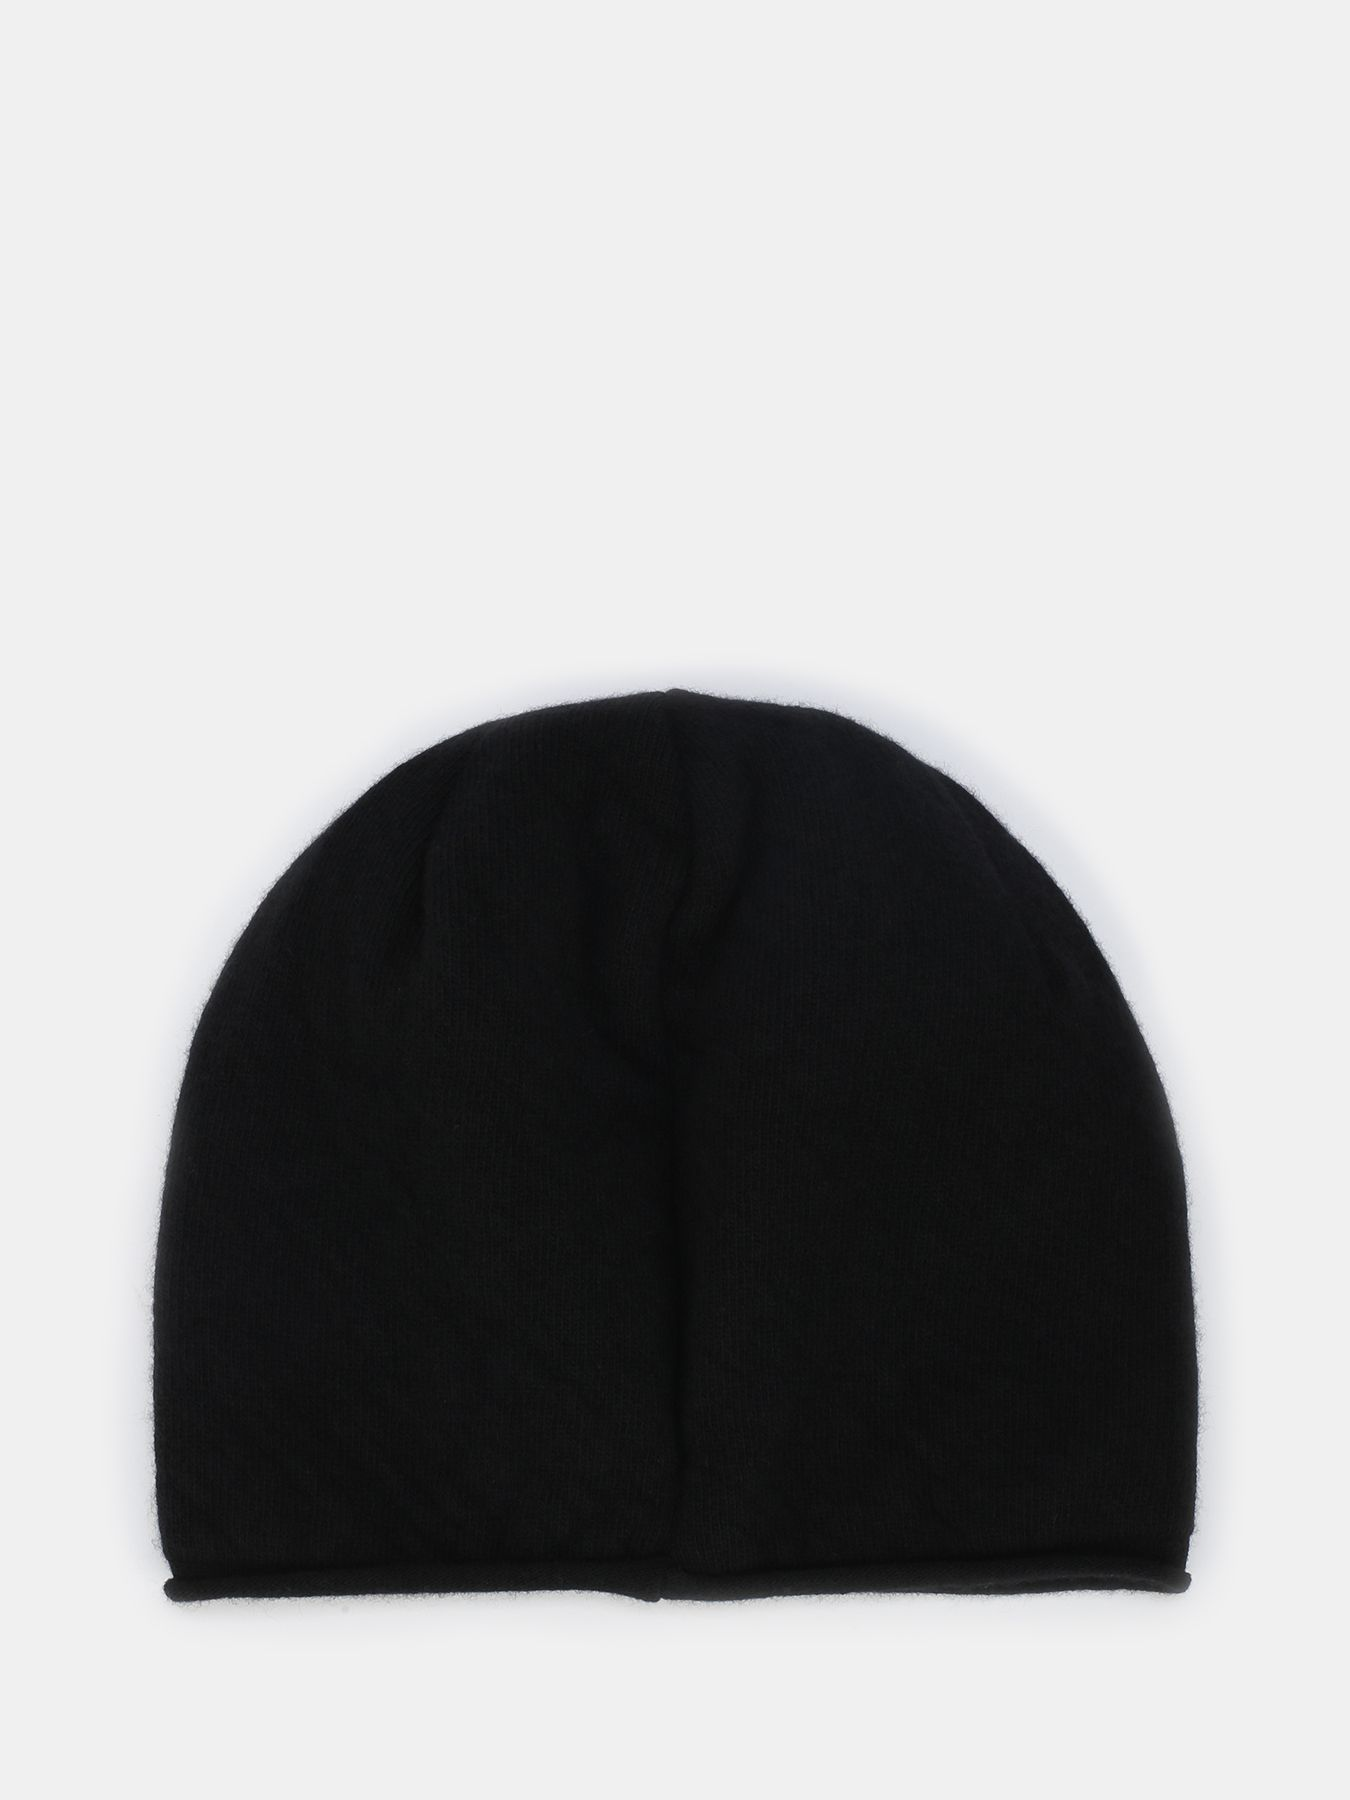 Шапка Karl Lagerfeld Шапка шапка freespirit freespirit mp002xw1agwb